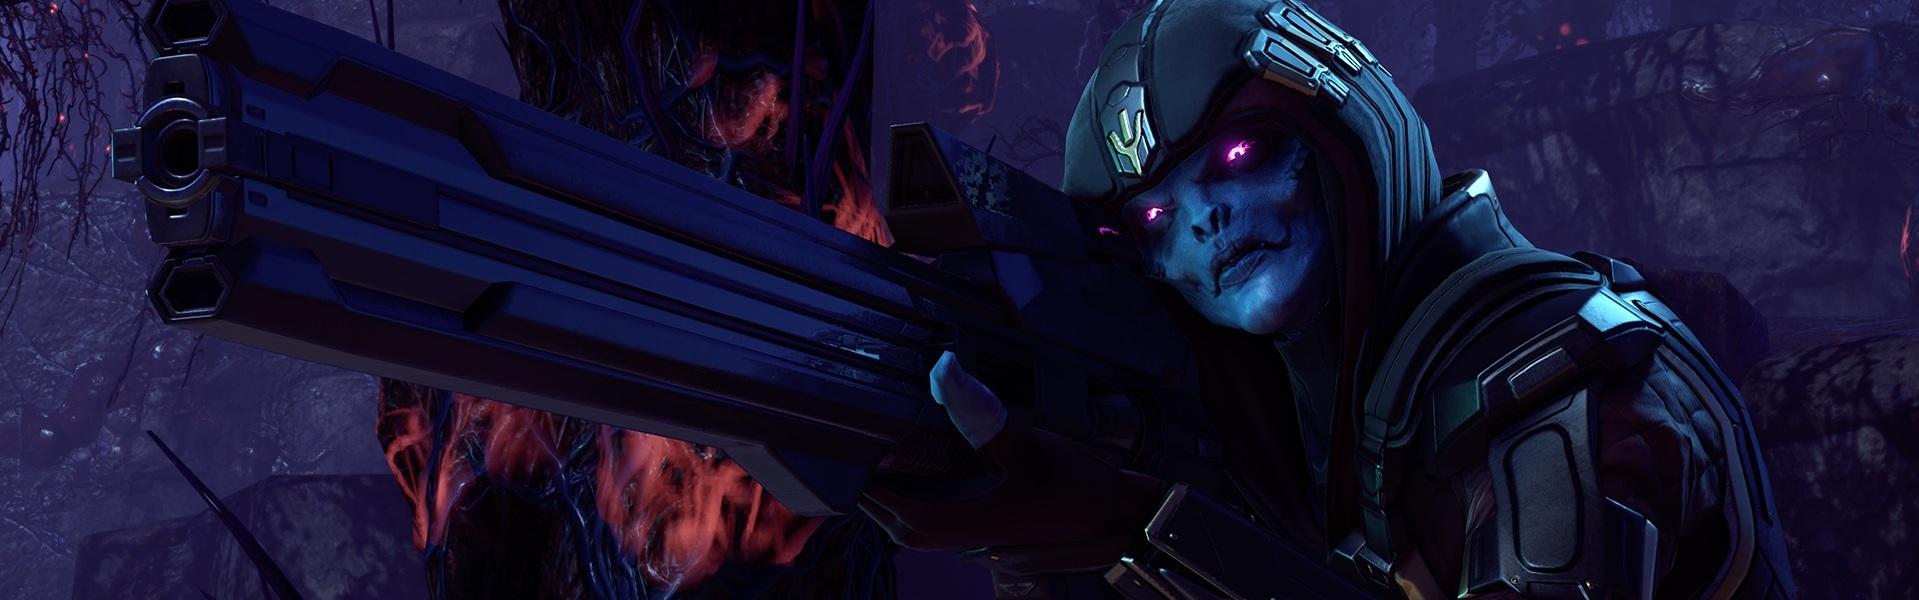 XCOM 2: War of the Chosen (DLC) Steam Key EUROPE